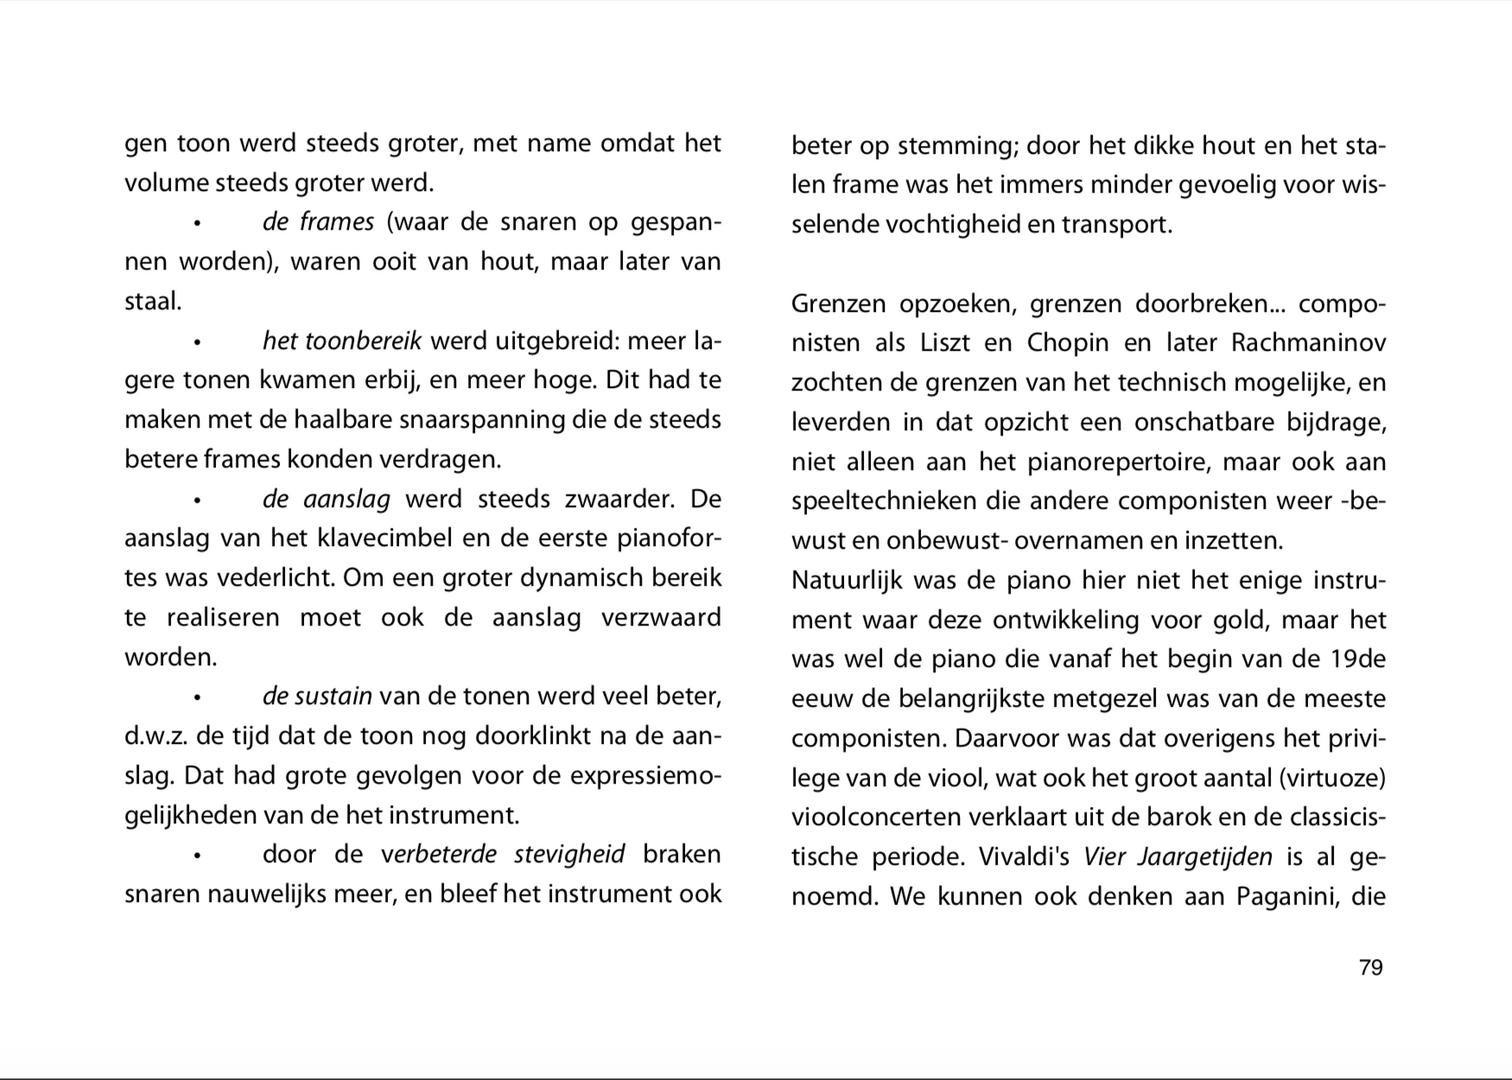 Cursusboek blz 79.png